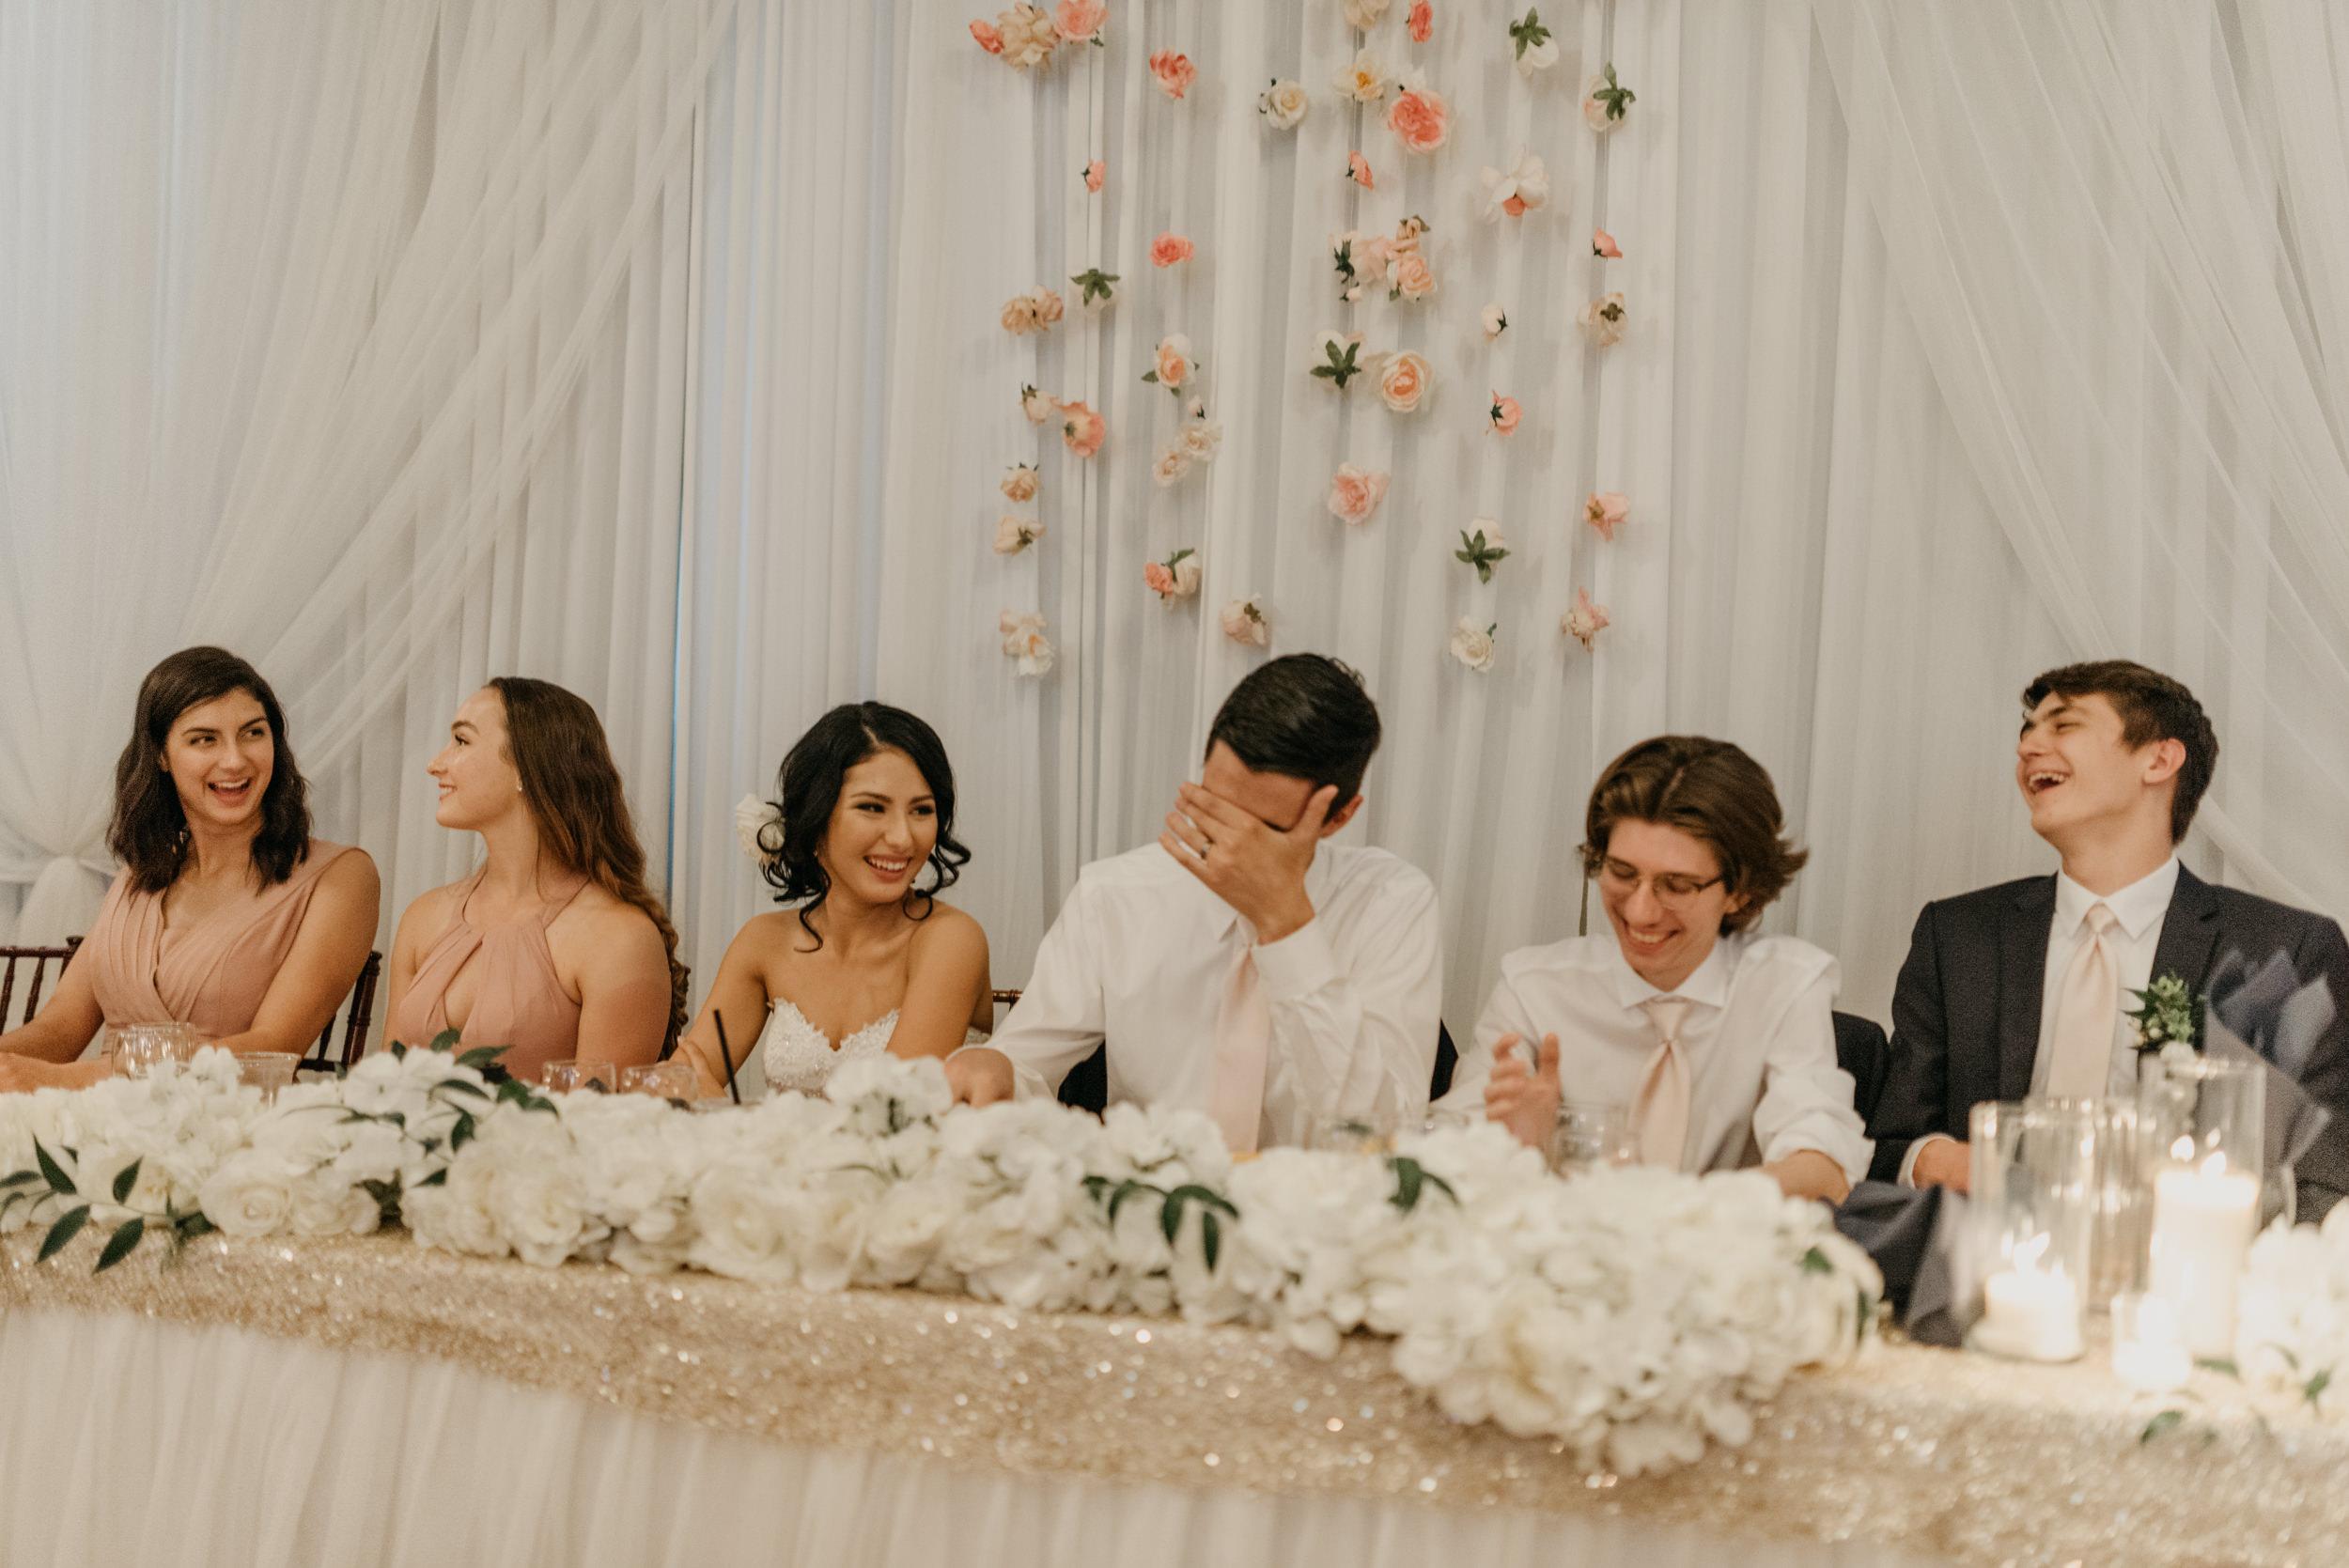 112-reception-west-end-ballroom-portland-wedding-photographer-8546.jpg